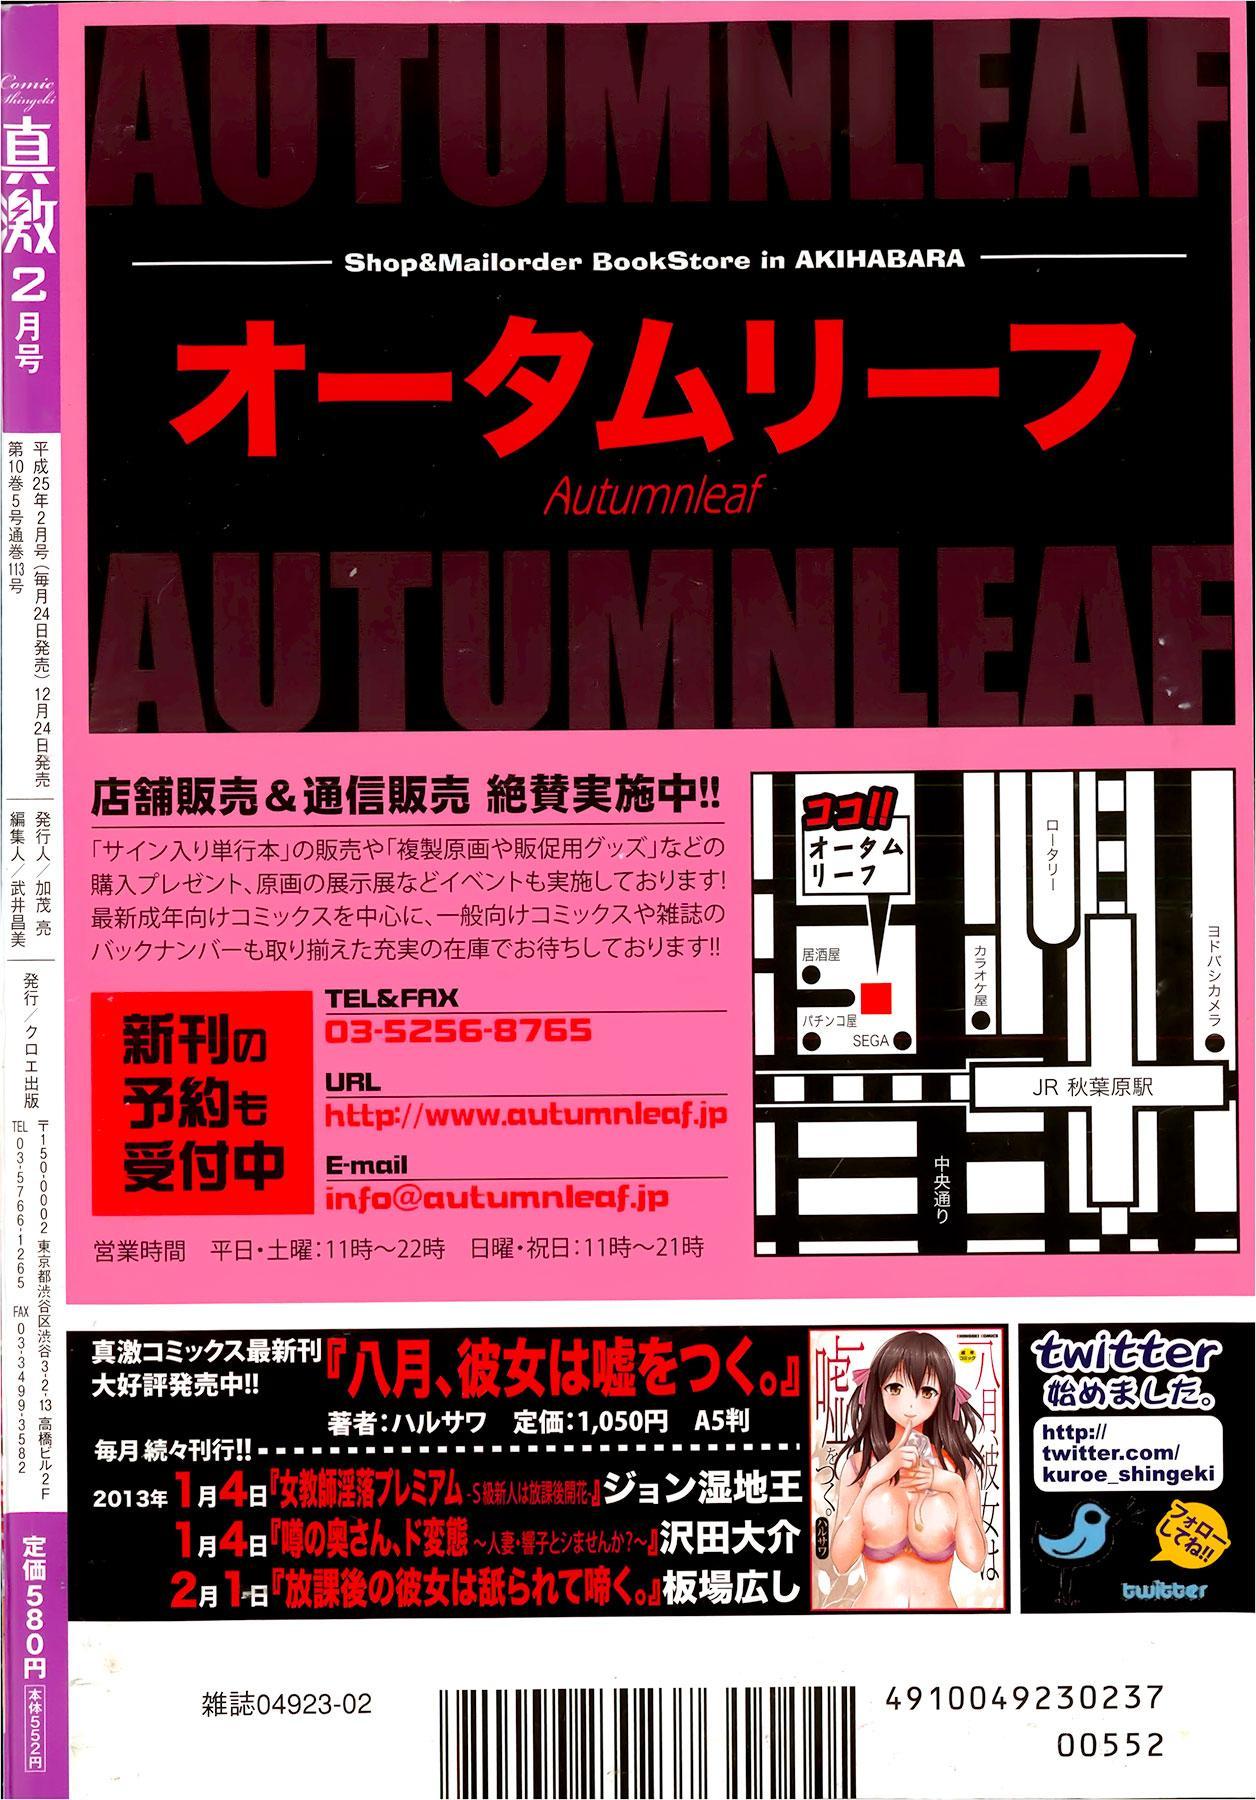 COMIC Shingeki 2013-02 379